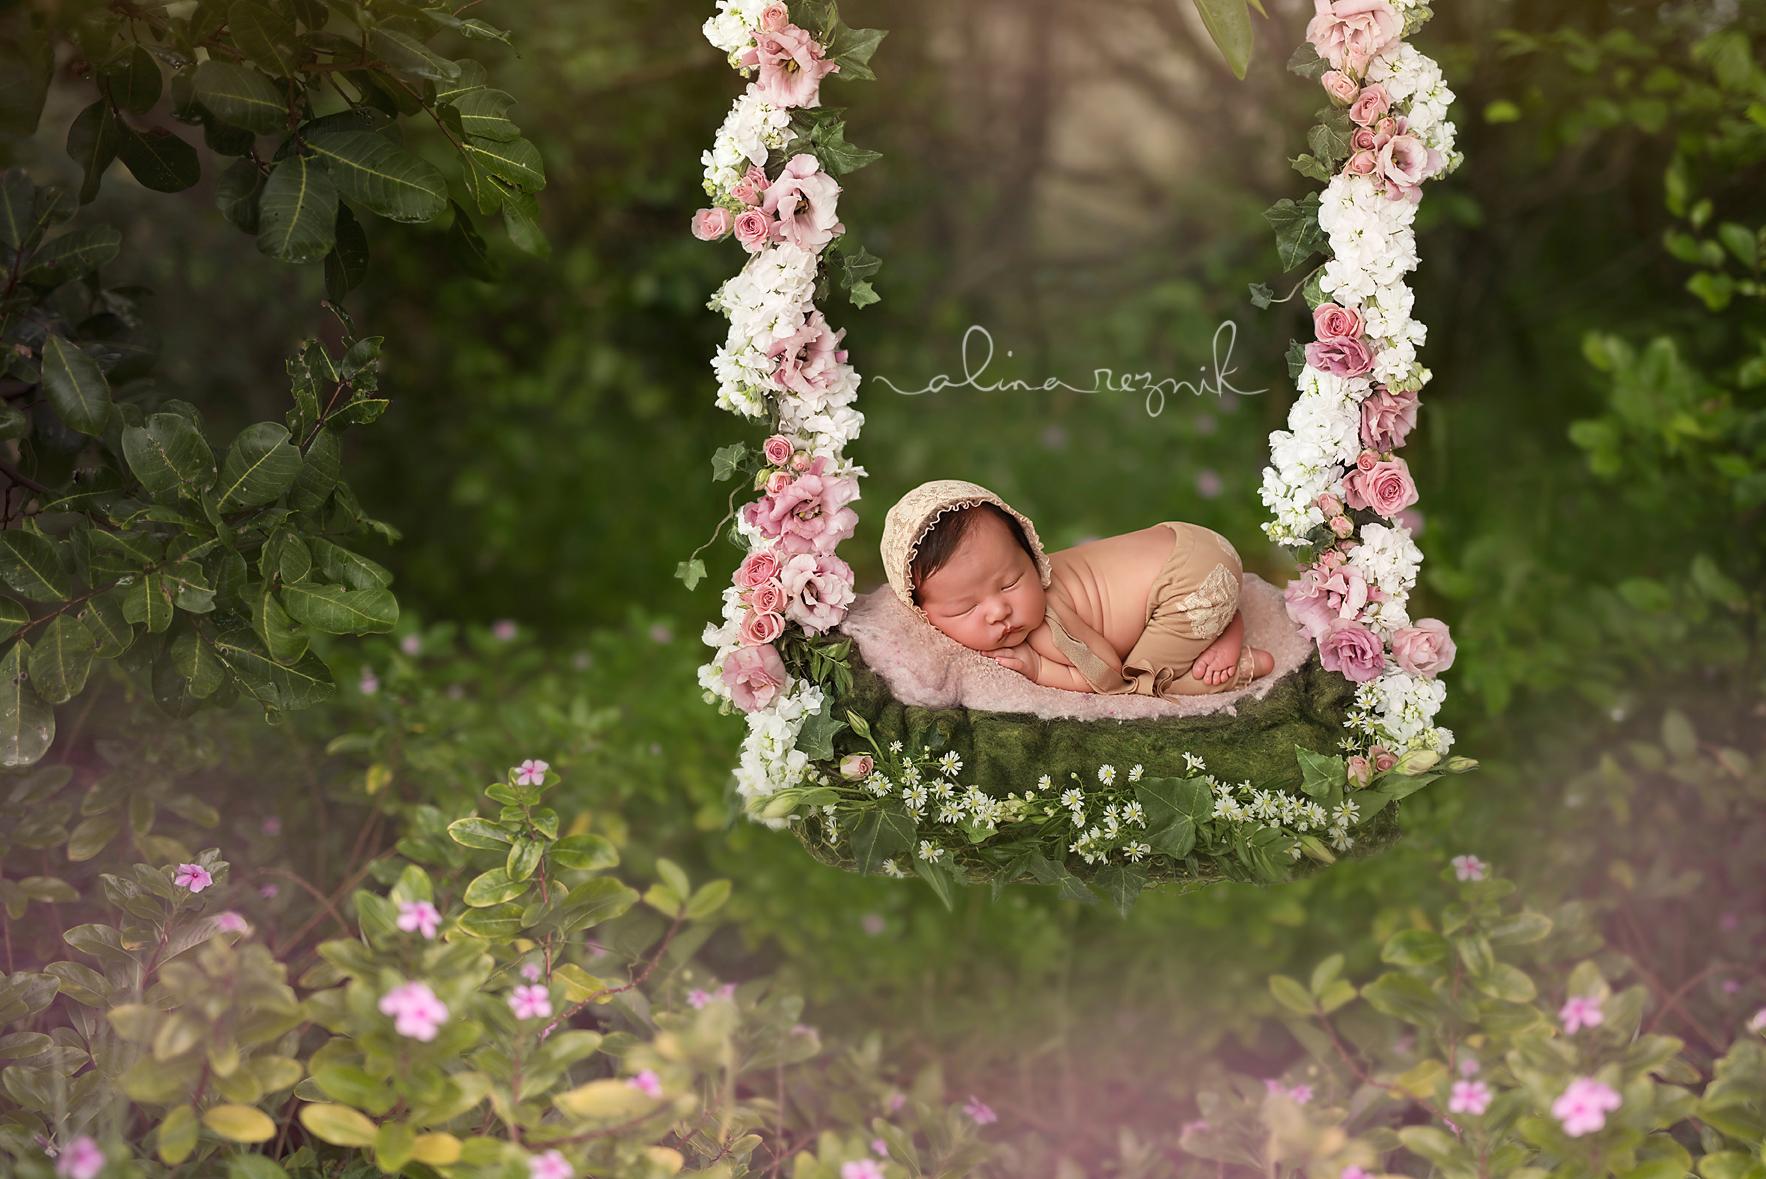 Staten Island Newborn Photography